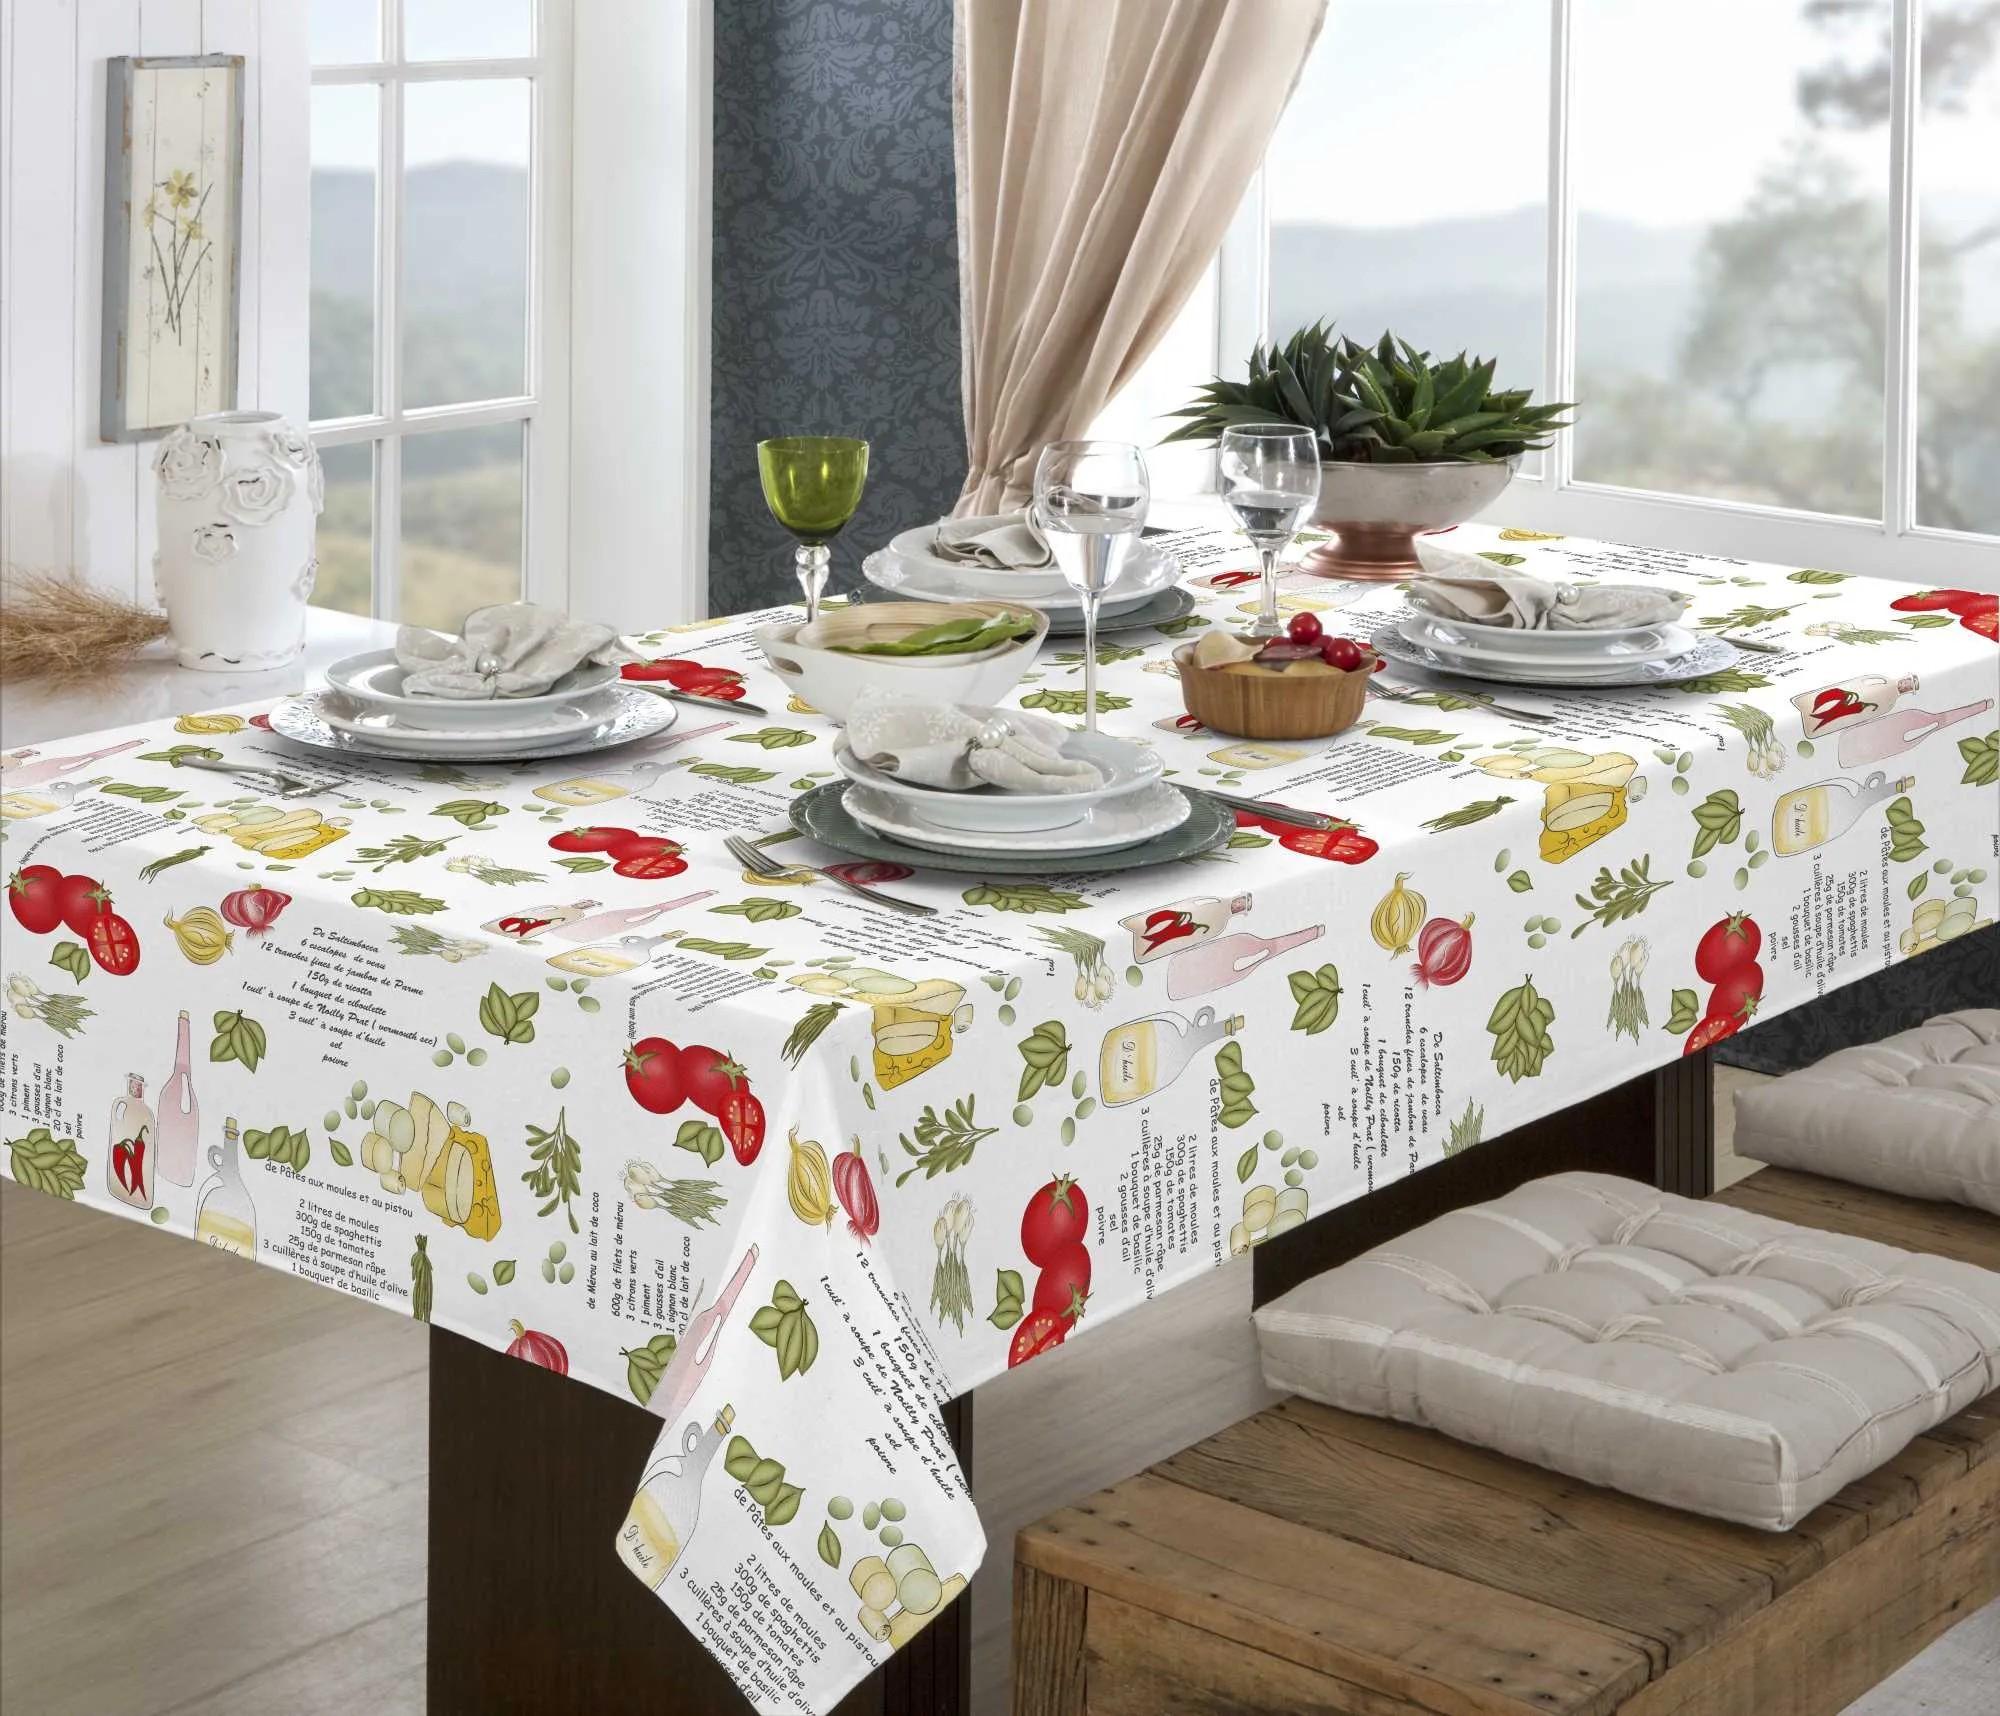 Toalha de mesa retangular 1,40 x 2,90 m -10 lugares - pratic limpa fácil  temperos - raner